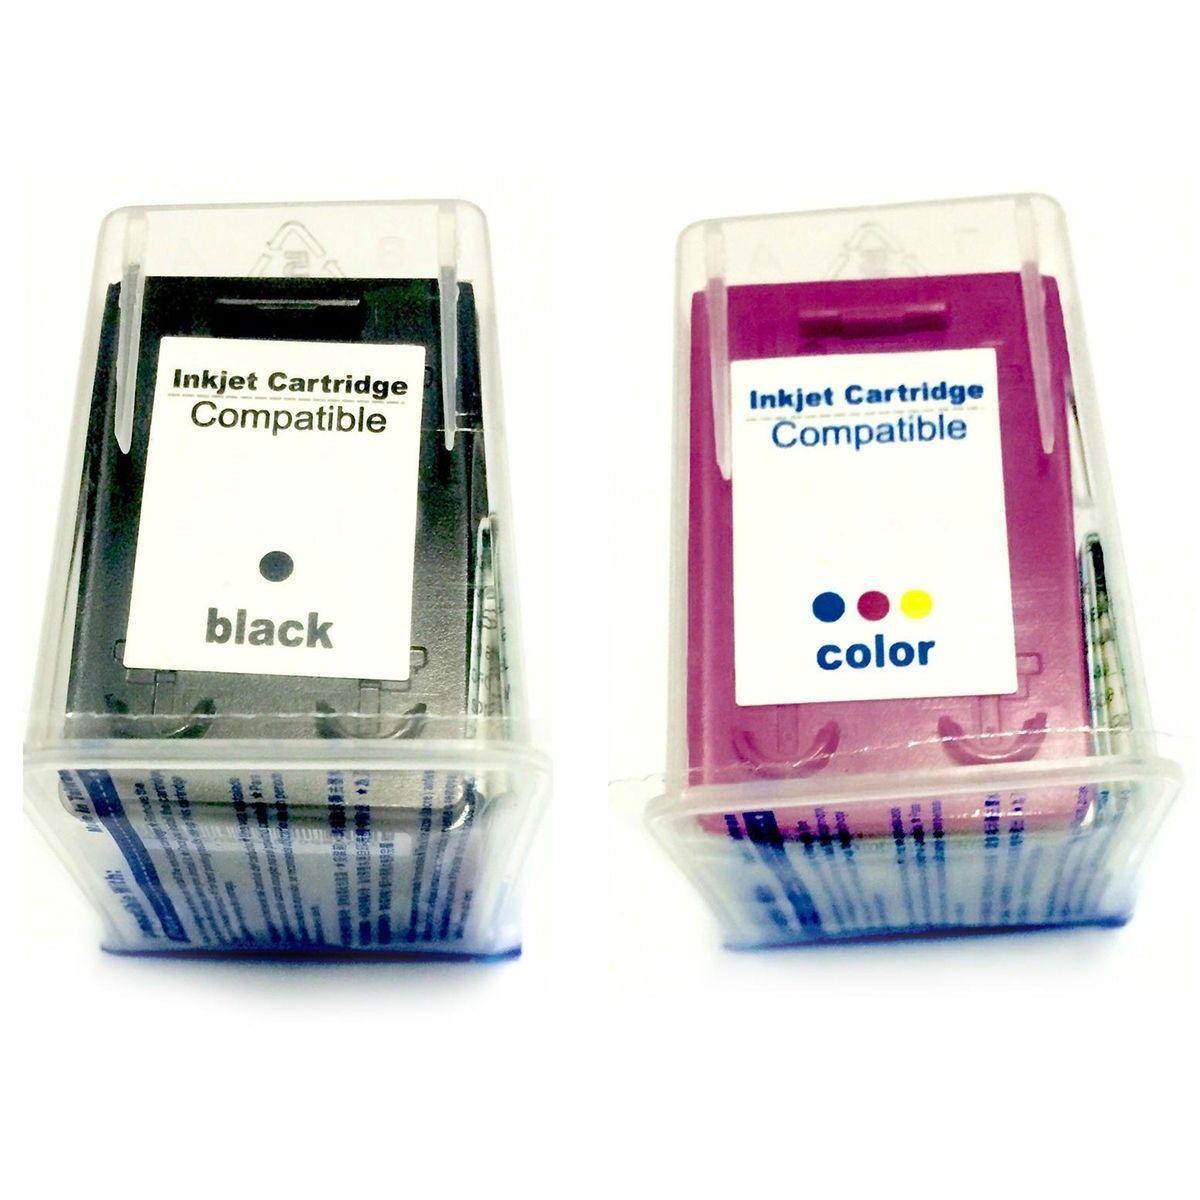 Compatível: Kit Colorido de Cartucho de Tinta 122xl 122 para Impressora HP 1000 1050 1055 2000 2050 3000 3050a